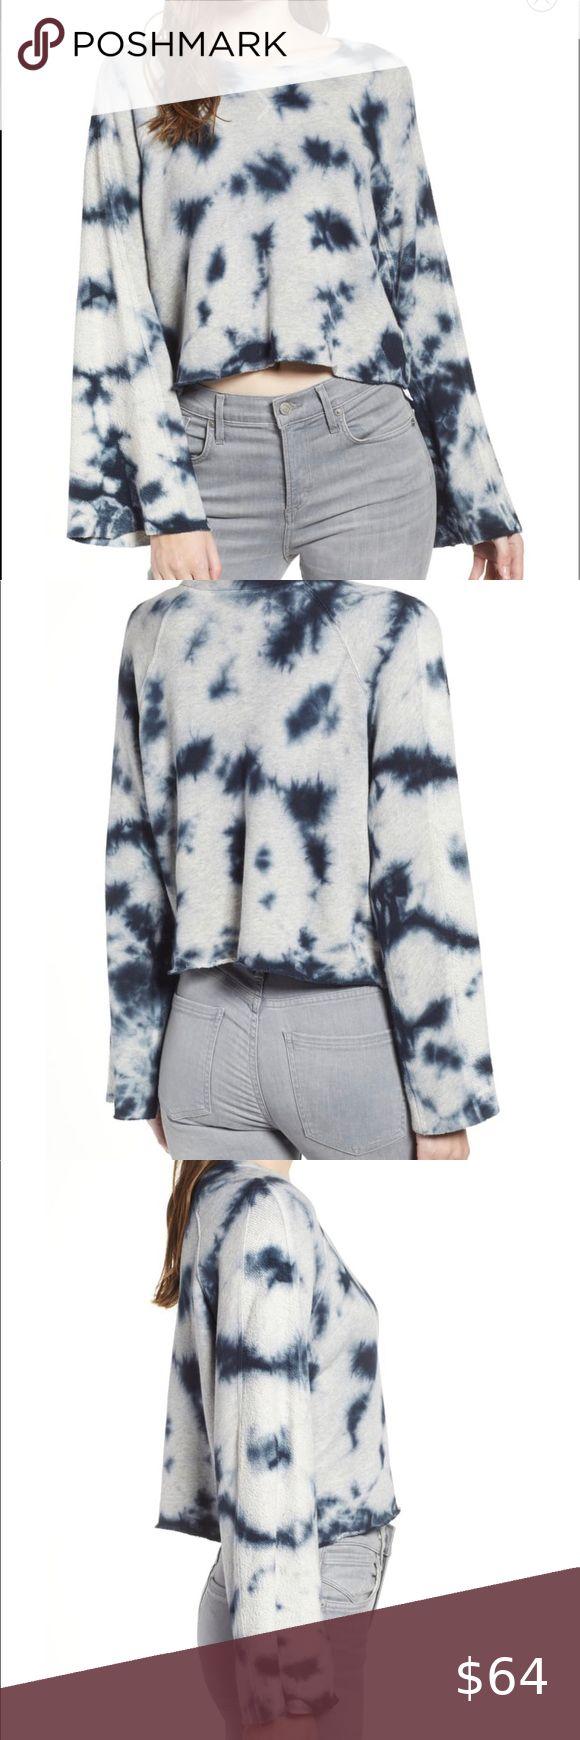 Nwt Splendid Night Haze Tie Dye Crop Sweatshirt Crop Sweatshirt Clothes Design Fashion [ 1740 x 580 Pixel ]